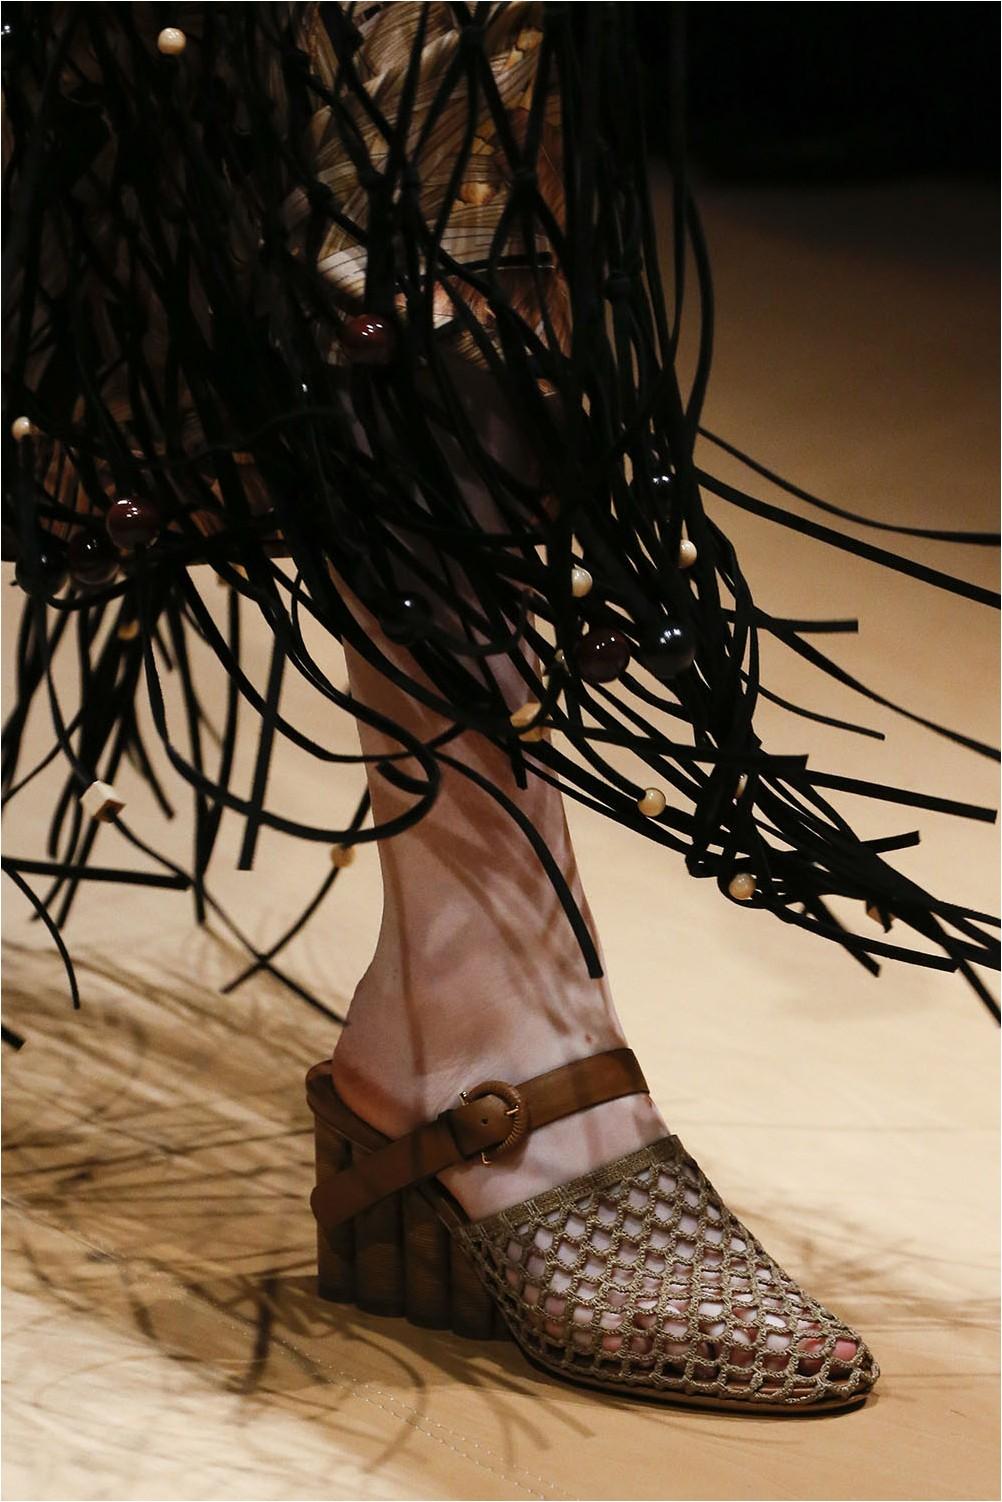 Mesh and weaving Salvatore Ferragamo